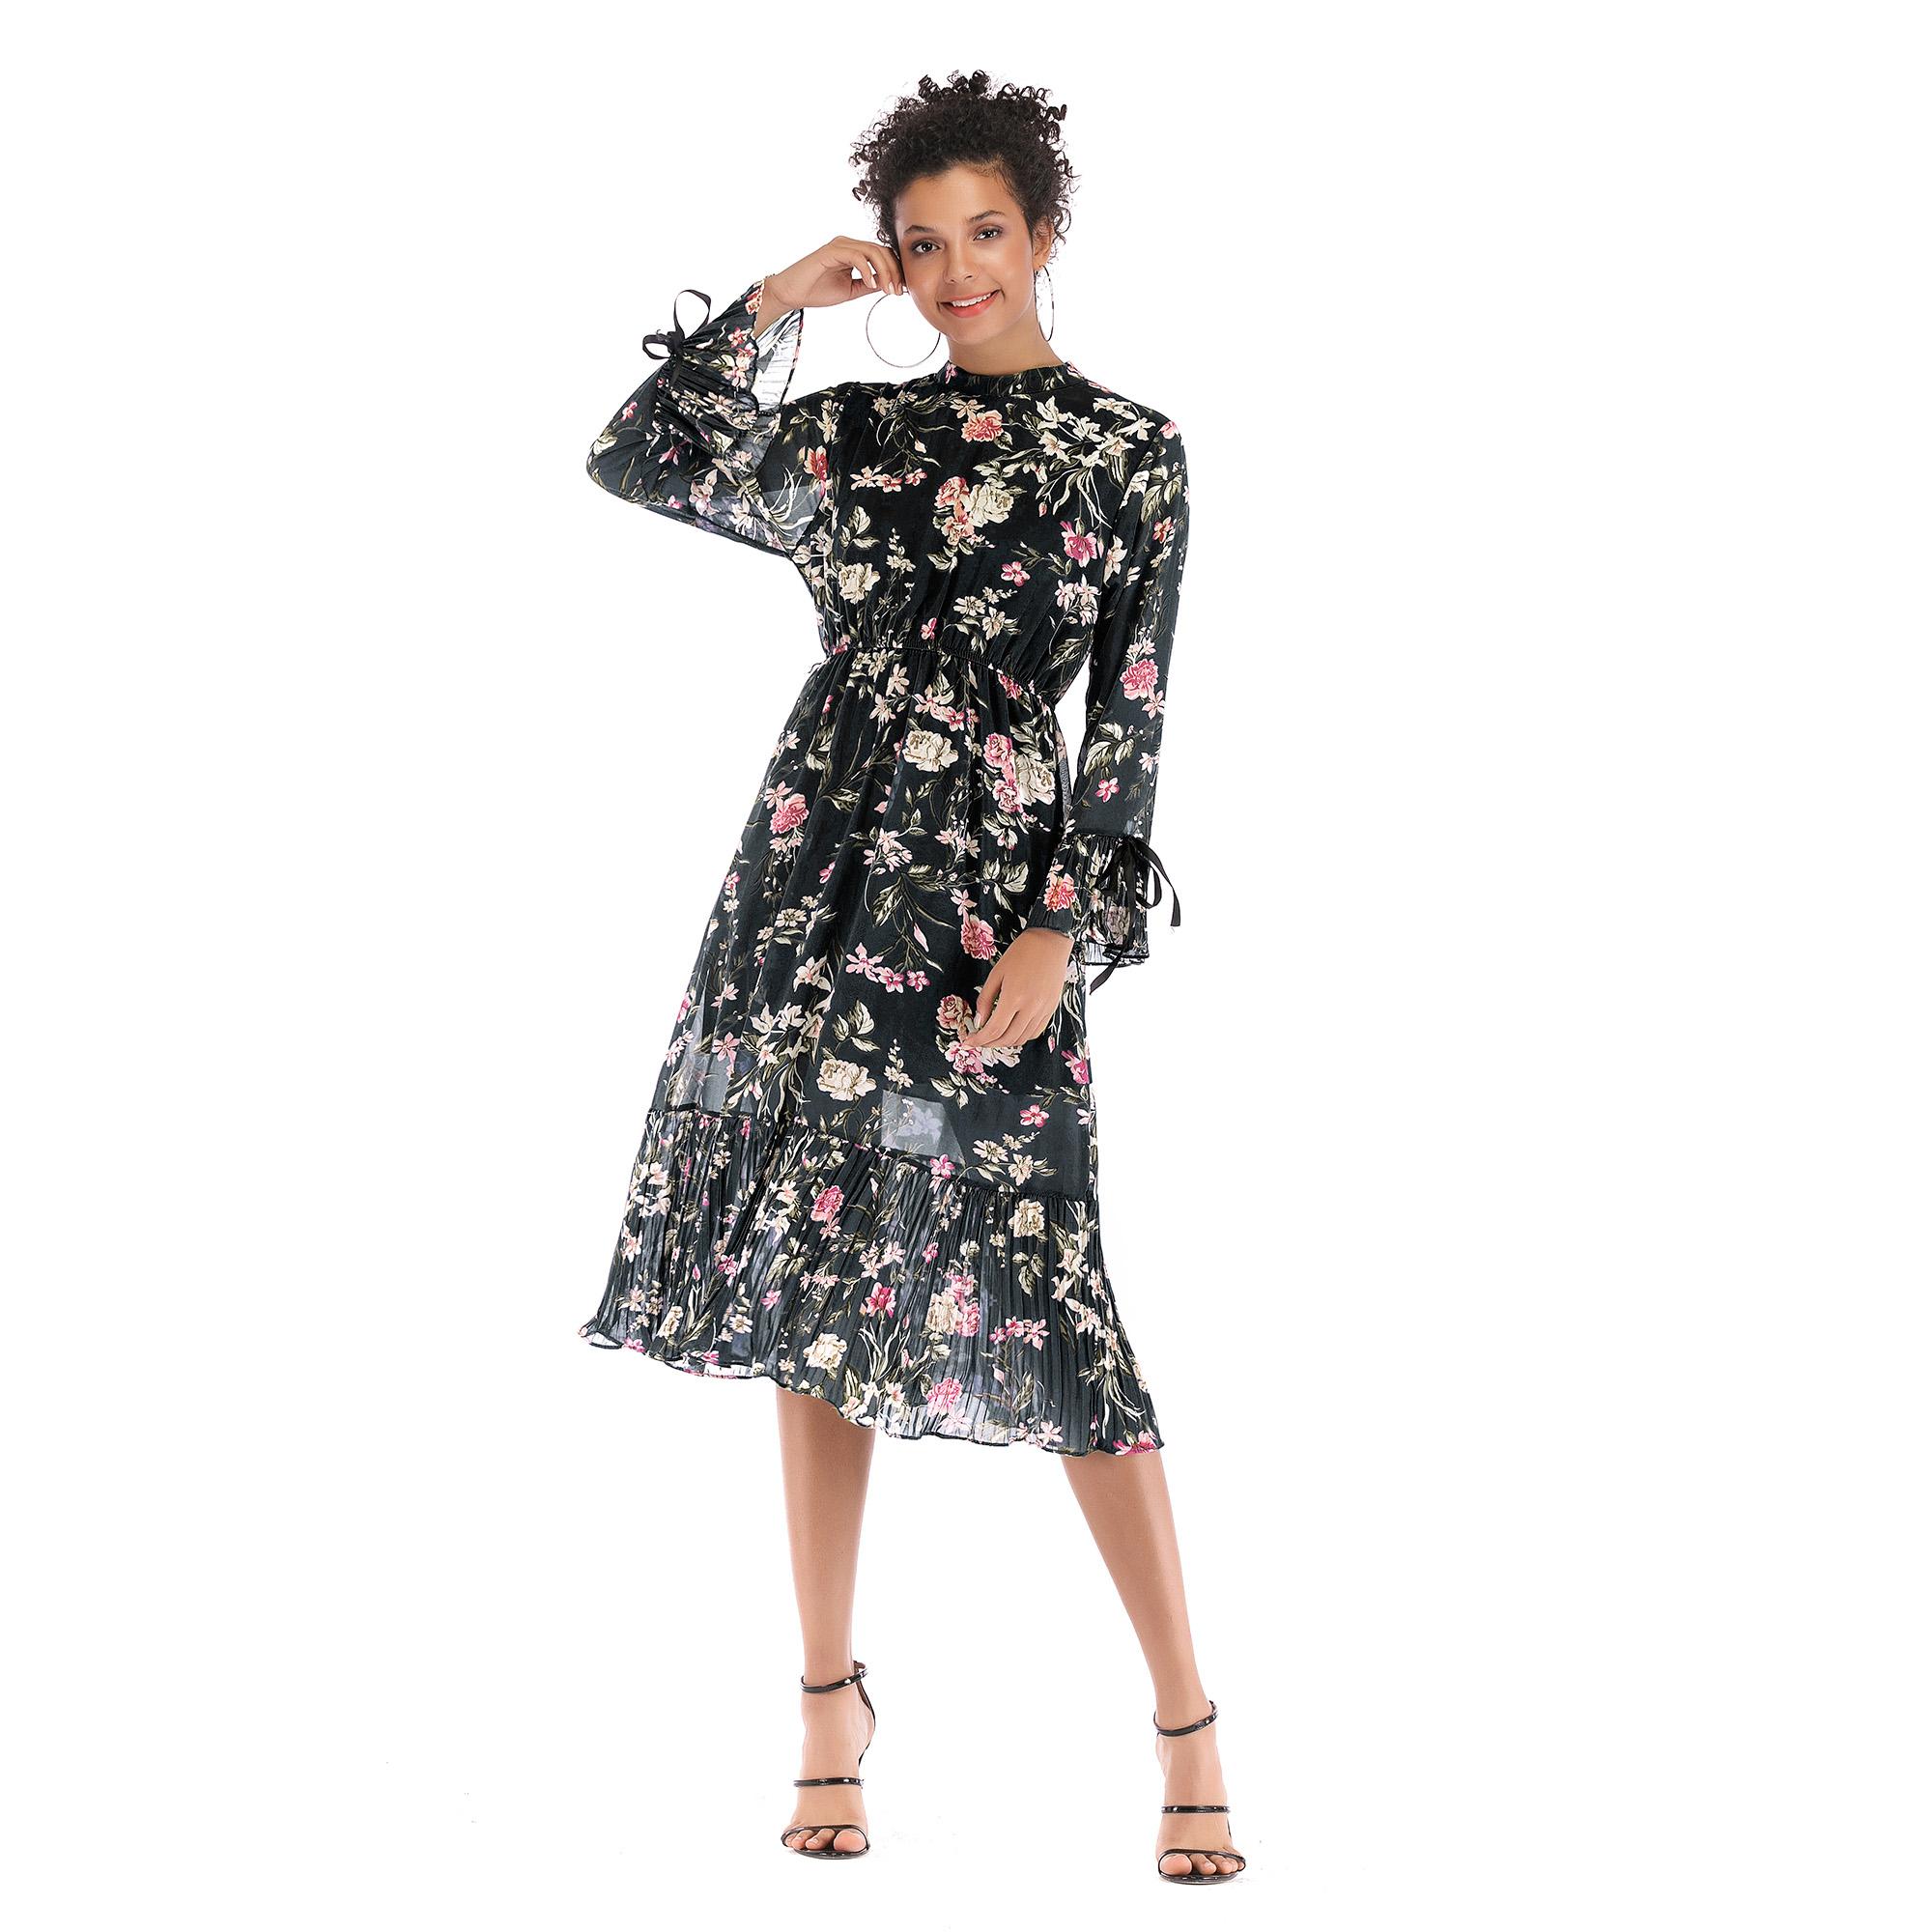 5908 ebay速卖通欧美女装新款长袖系带雪纺裙 中长大摆碎花连衣裙